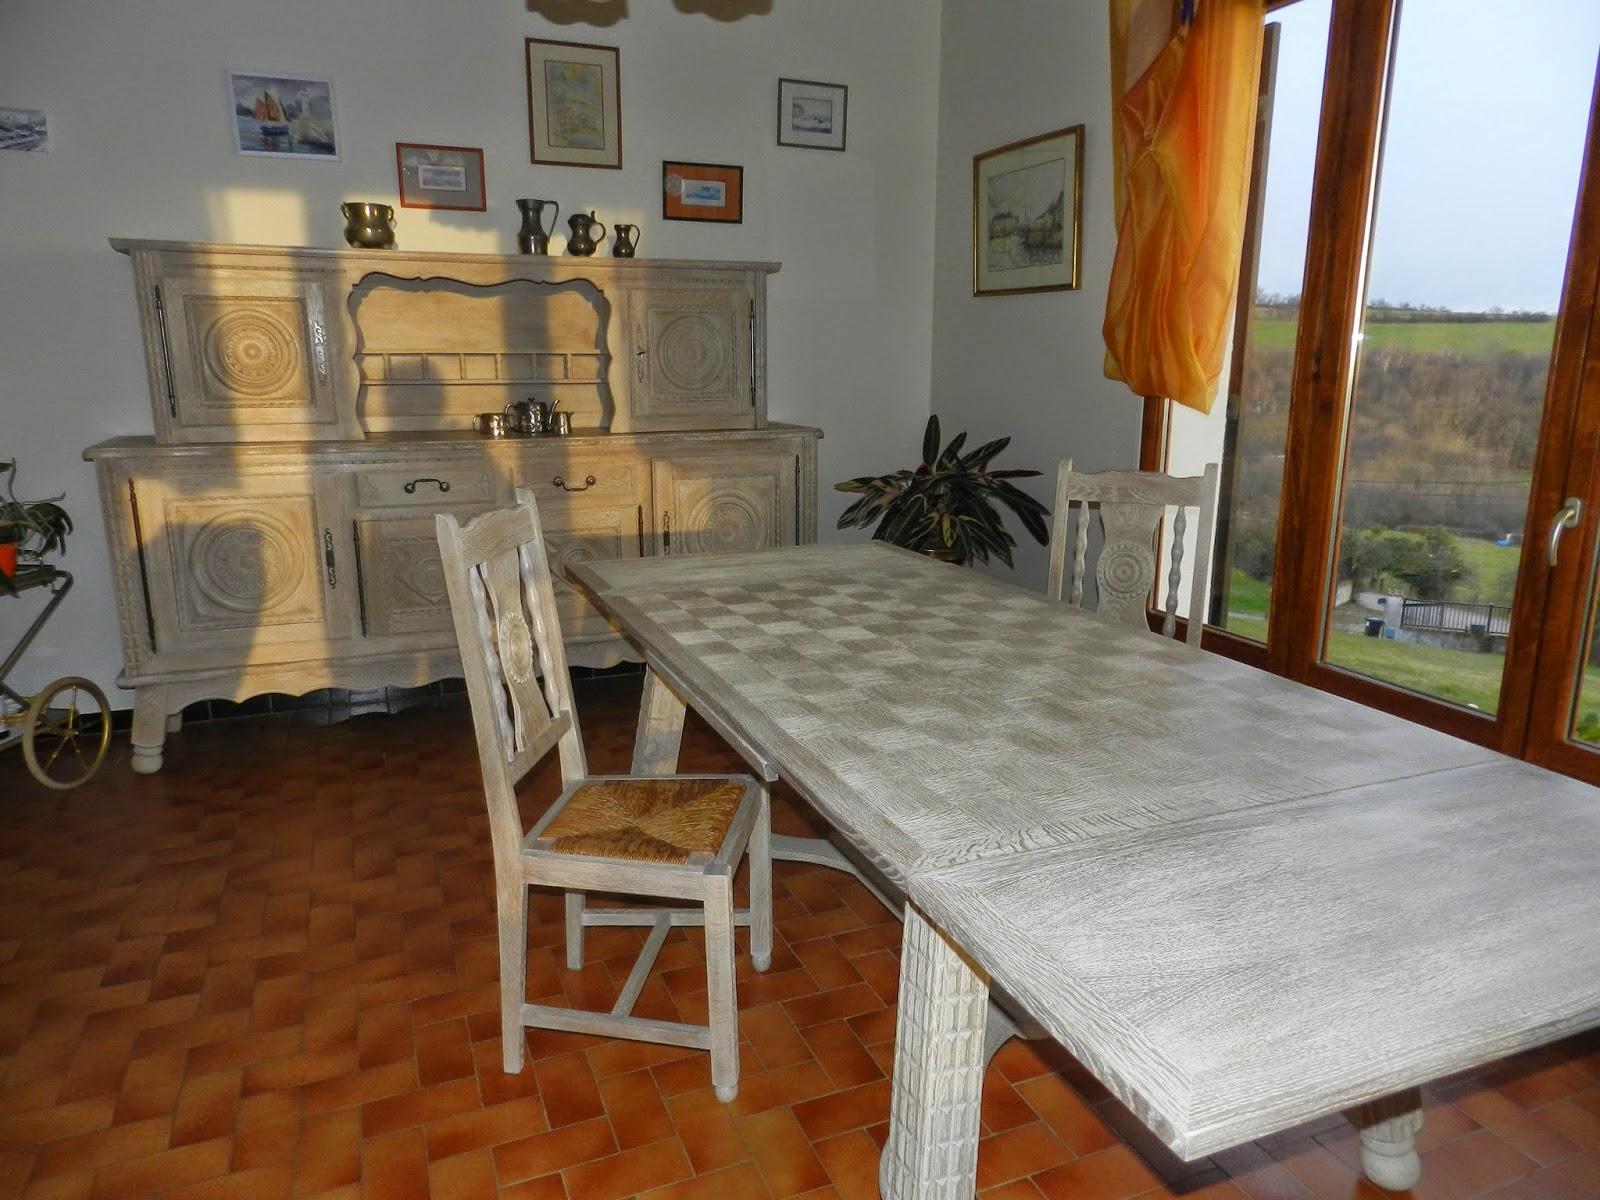 la sourigolote salle manger de type basque. Black Bedroom Furniture Sets. Home Design Ideas